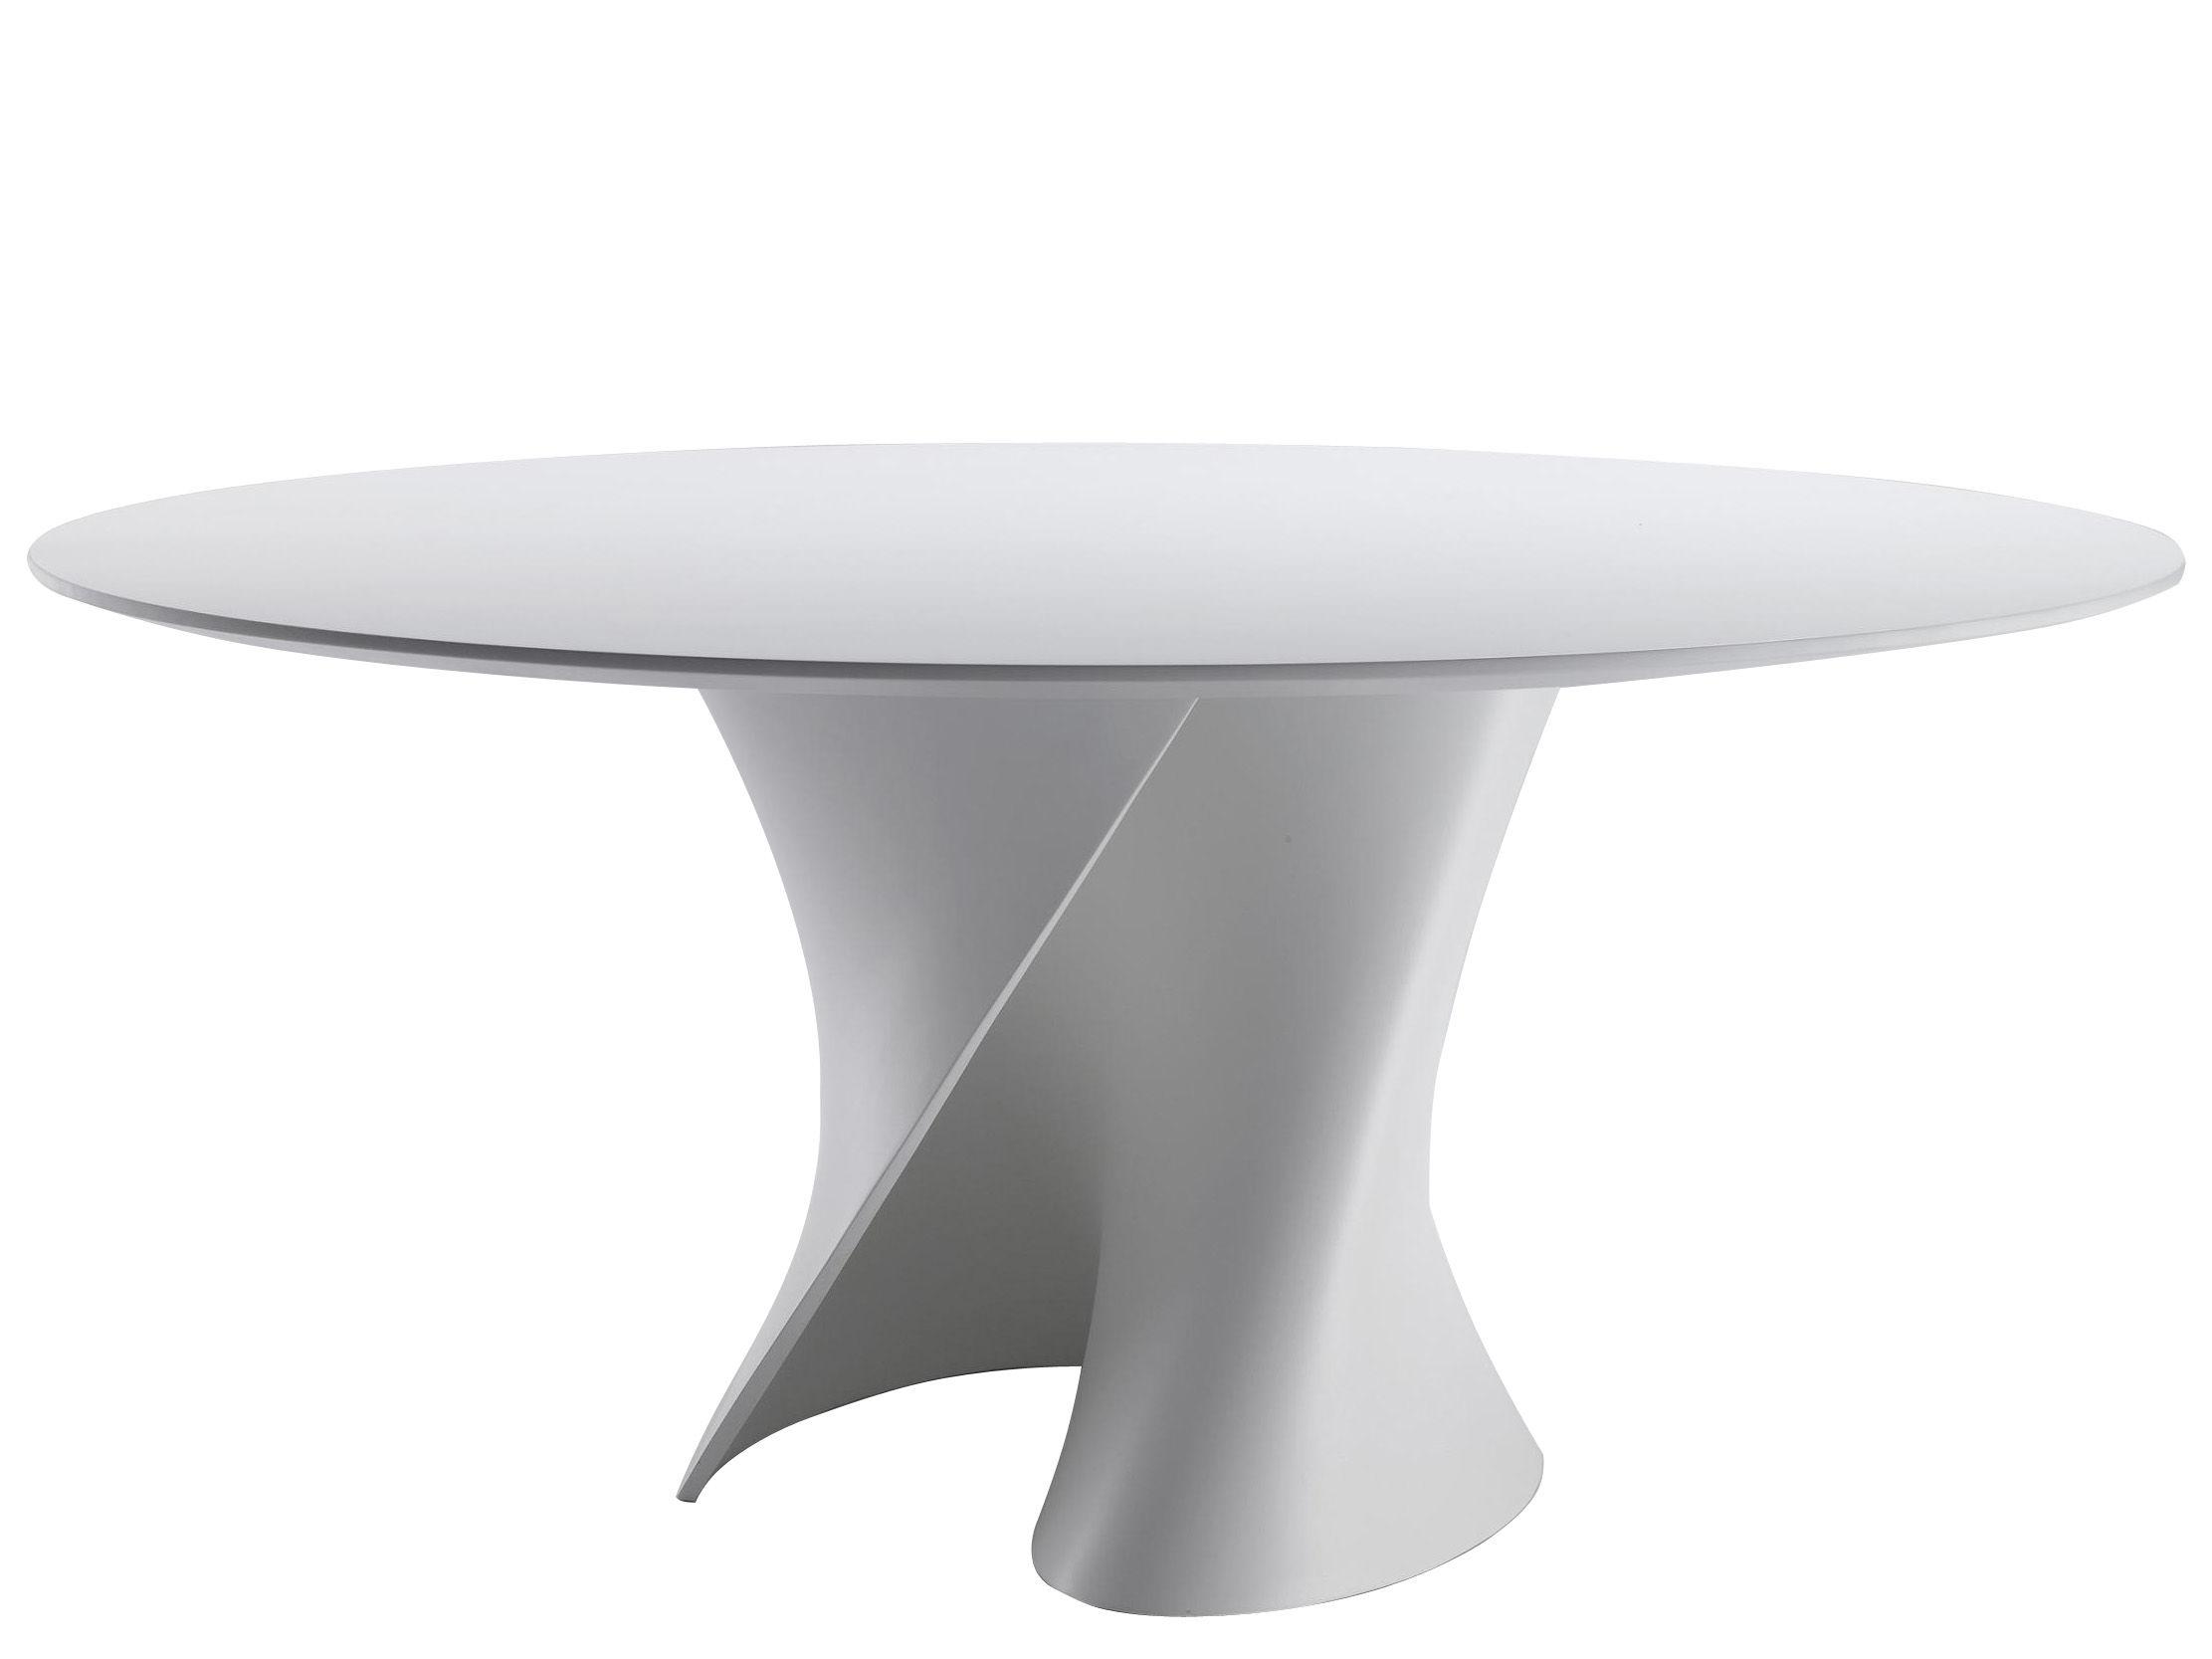 Table Ronde 140 Cm Amazing Cb Mikado Table De Design En Bois De